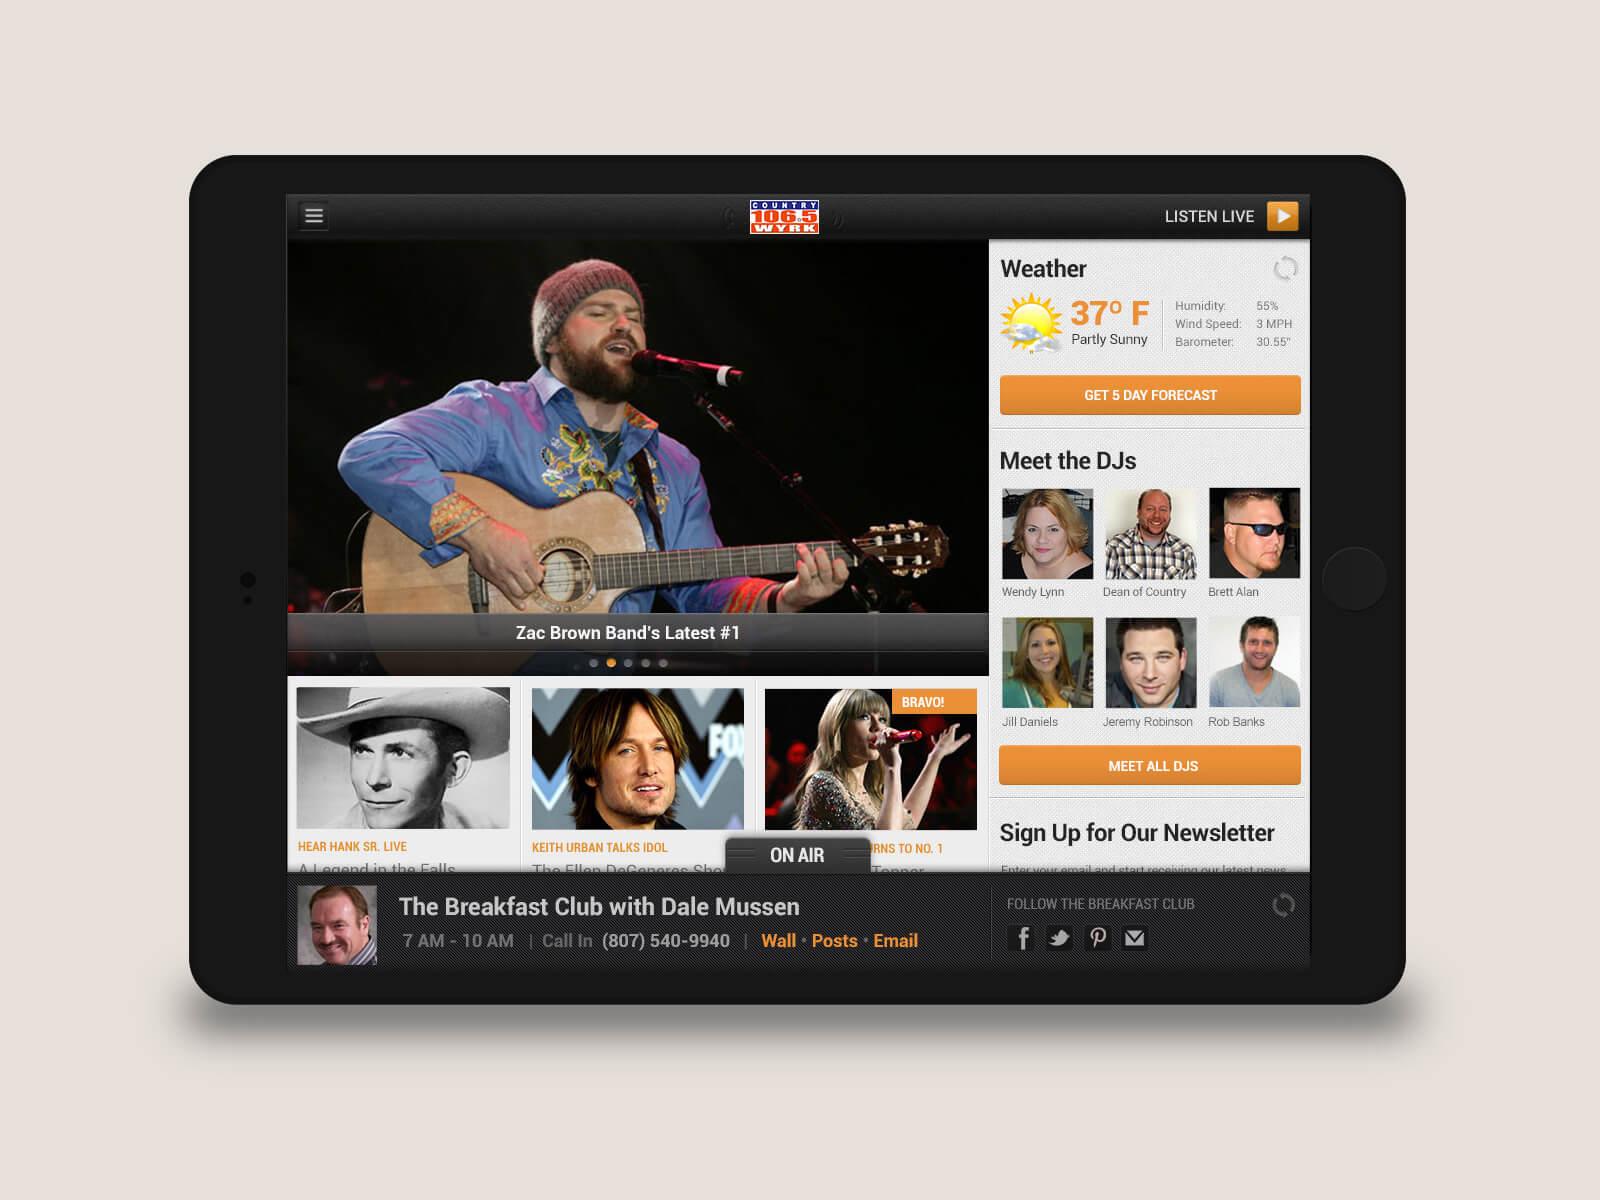 Townsquare Media - WYRK tablet ockups